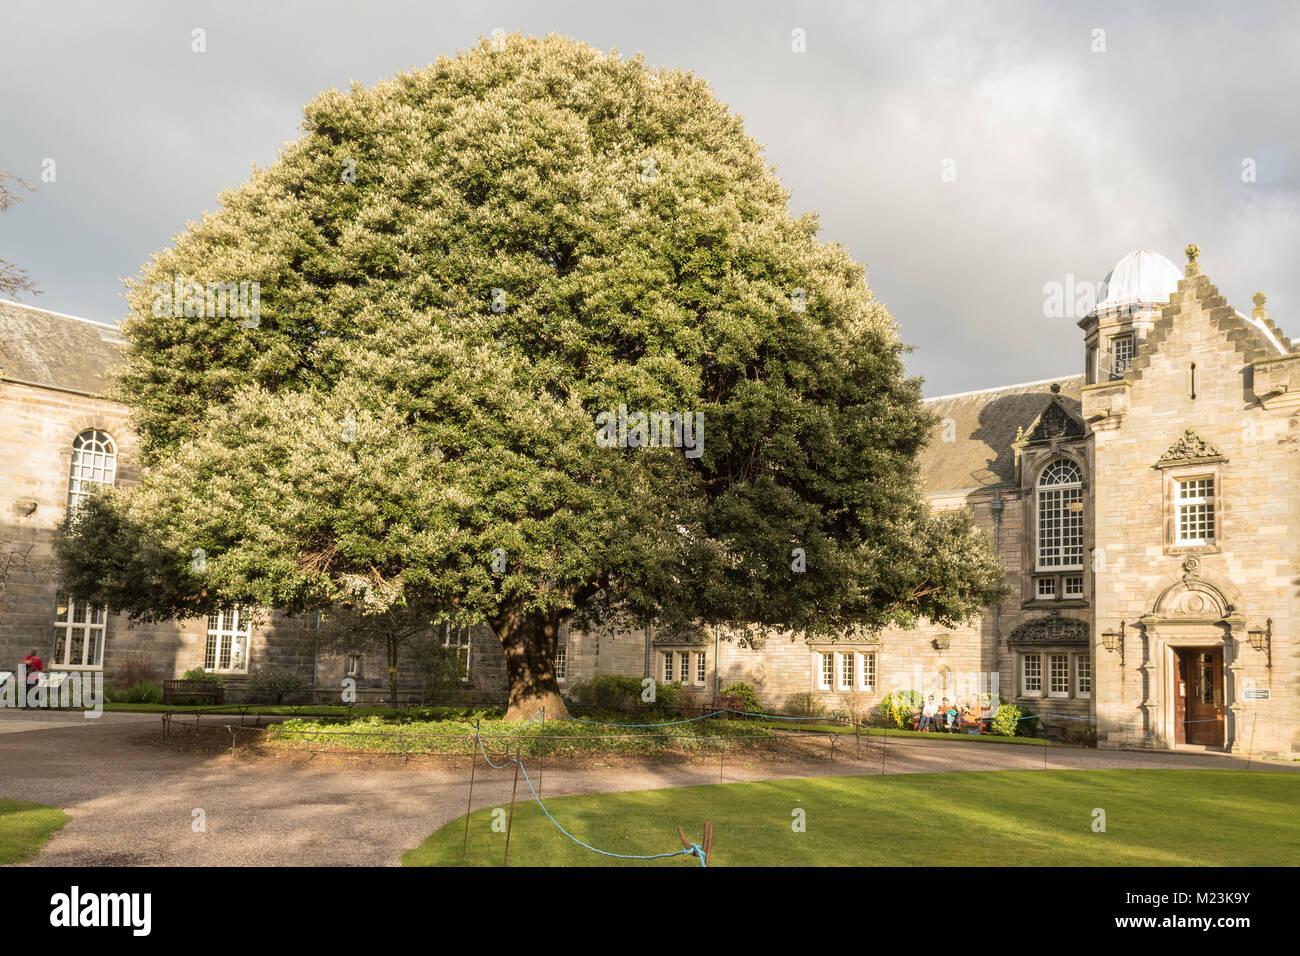 Holm Oak in St Marys Quadrangle, ST Mary's College, University of St Andrews, Scotland, UK - Stock Image